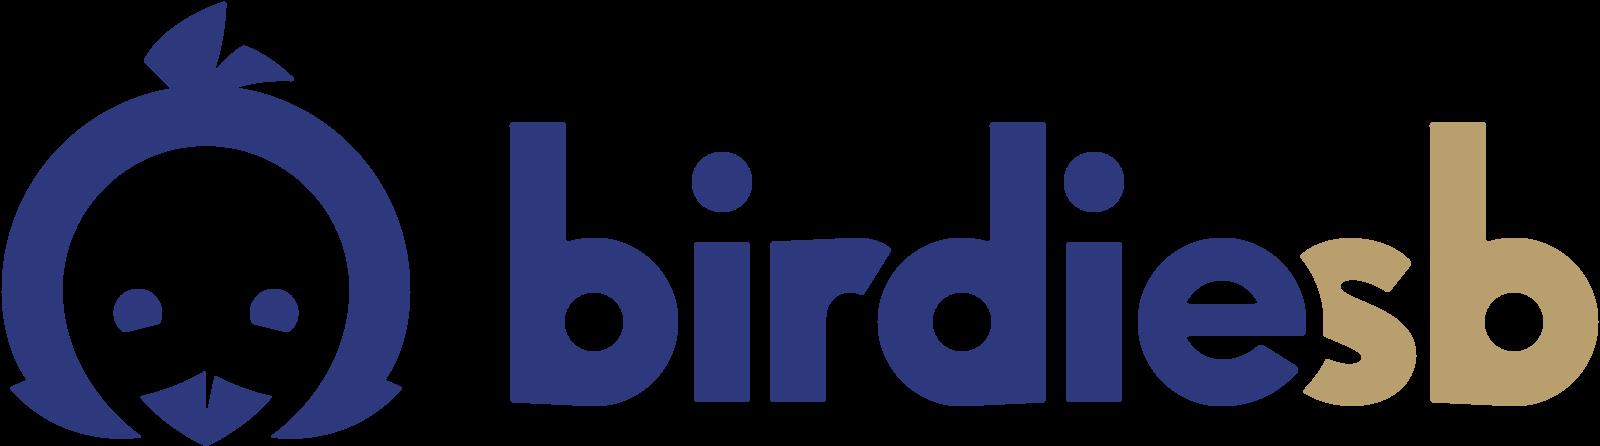 Birdie SB